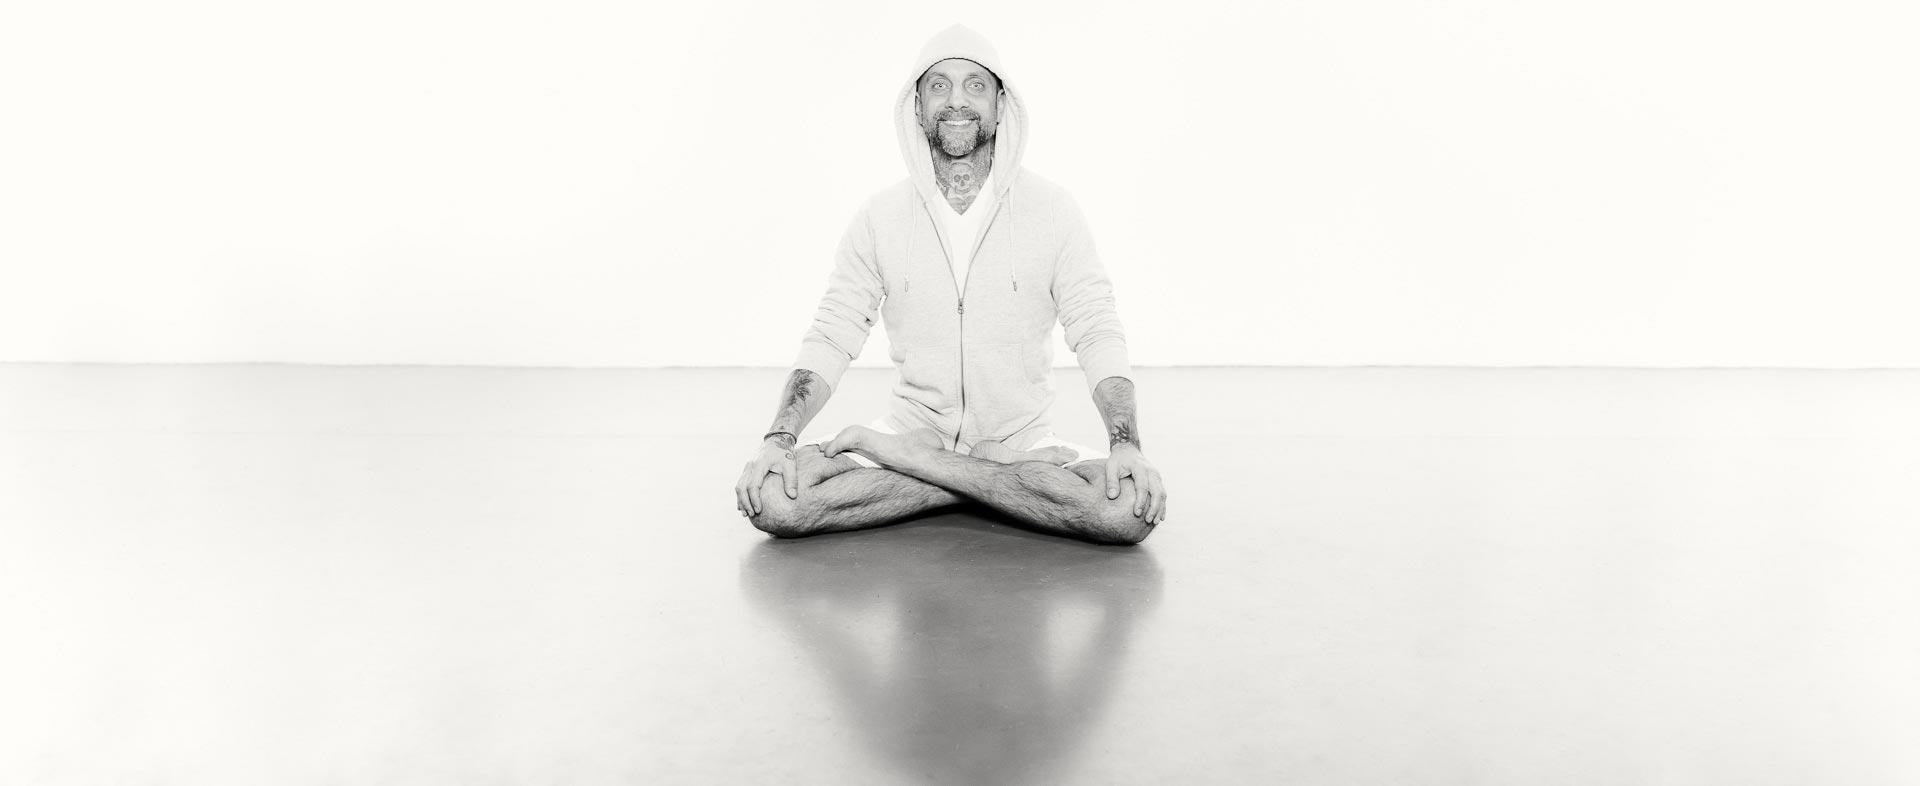 Jon Gee - Mindfulness